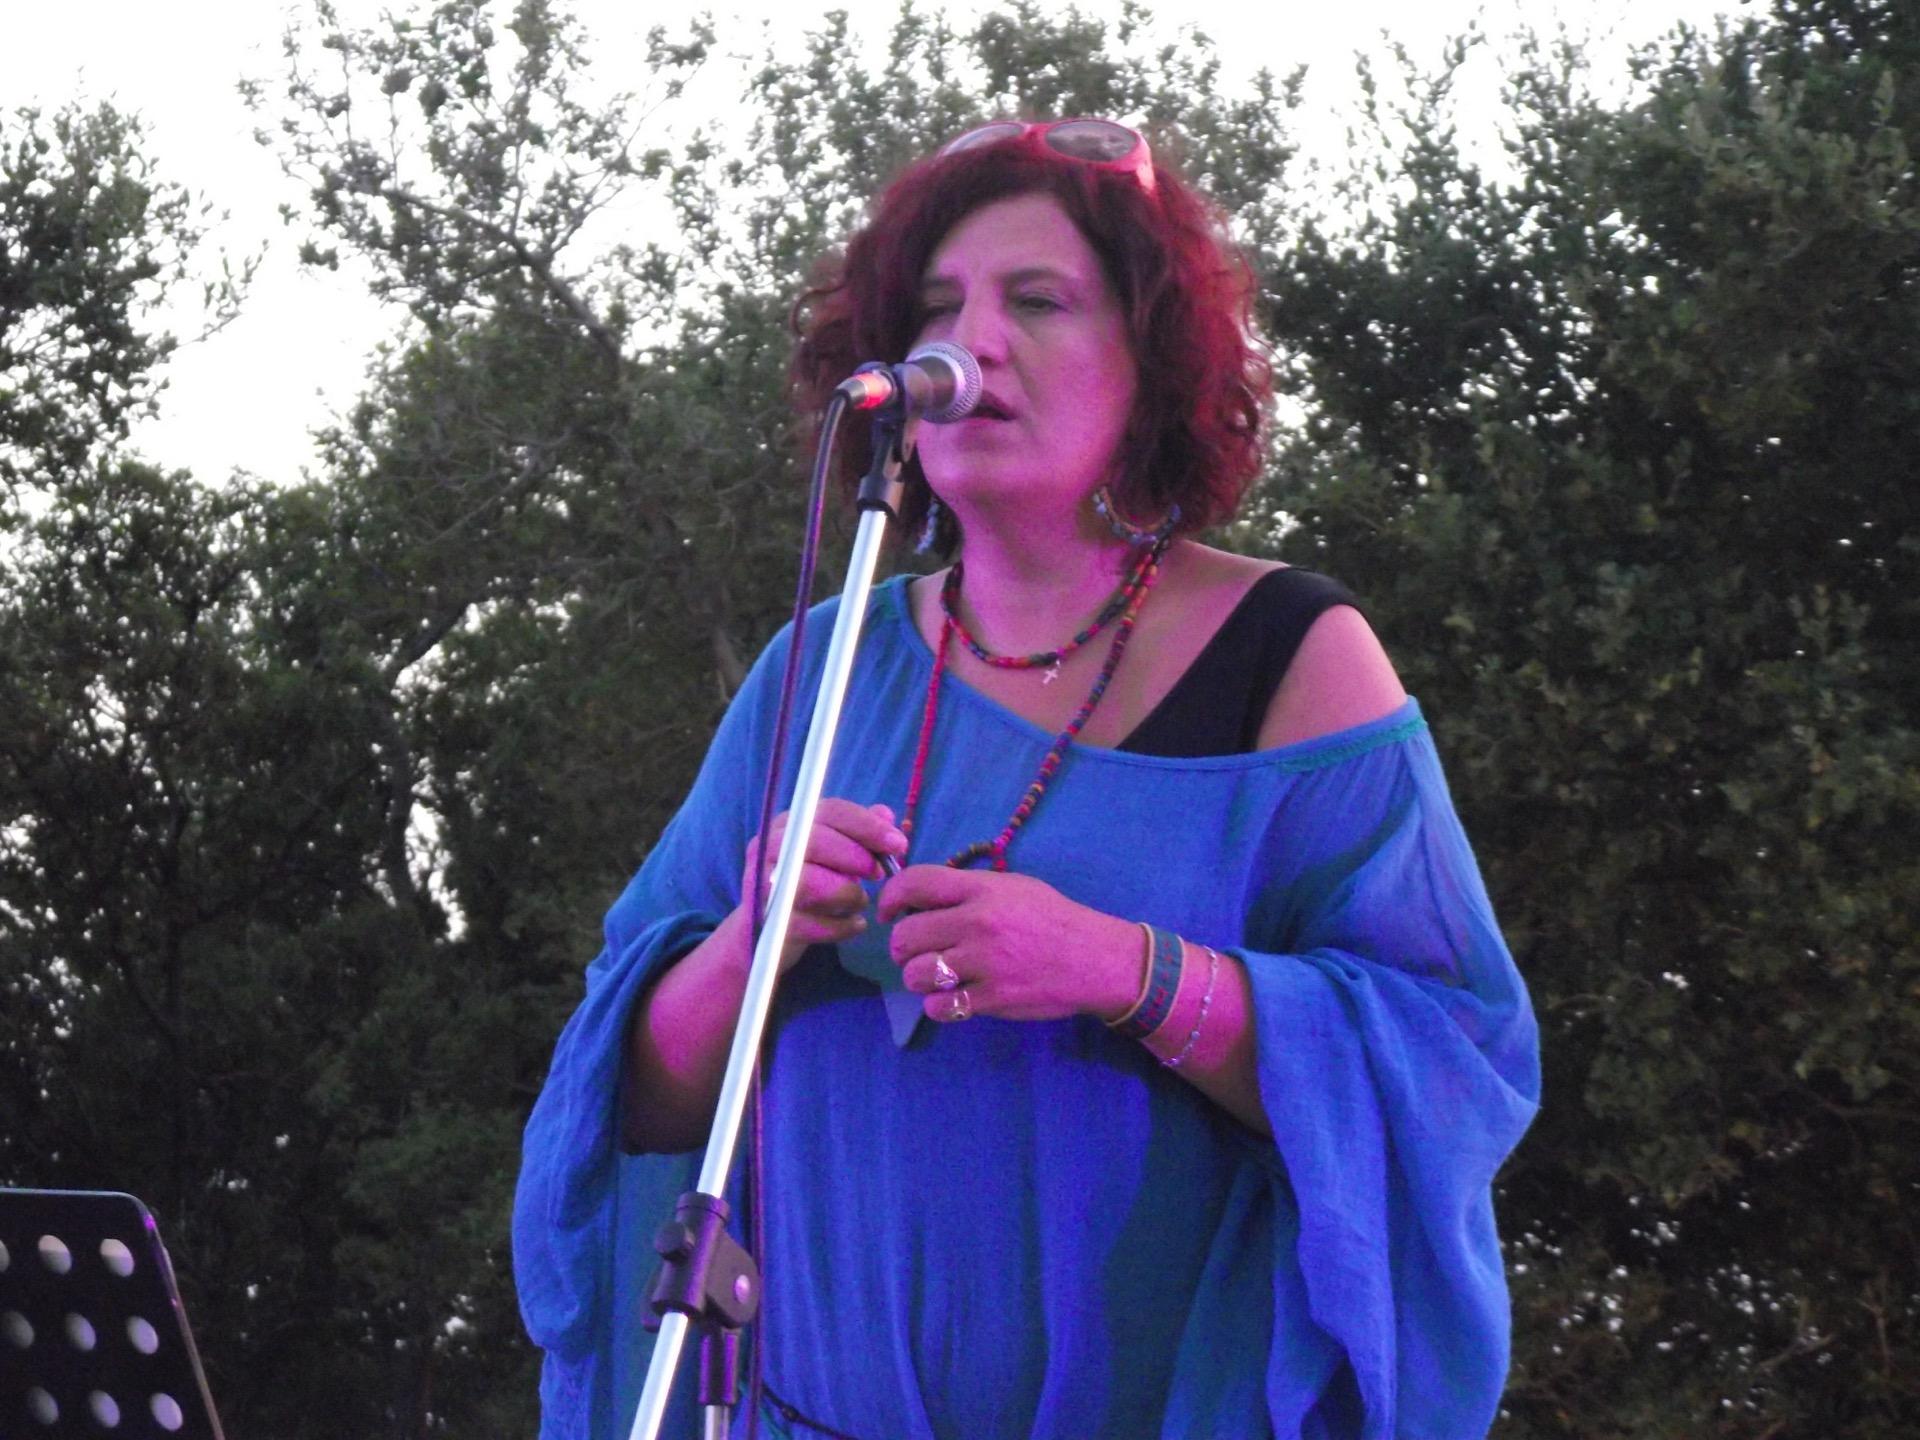 Aloni festival 2013 155.JPG